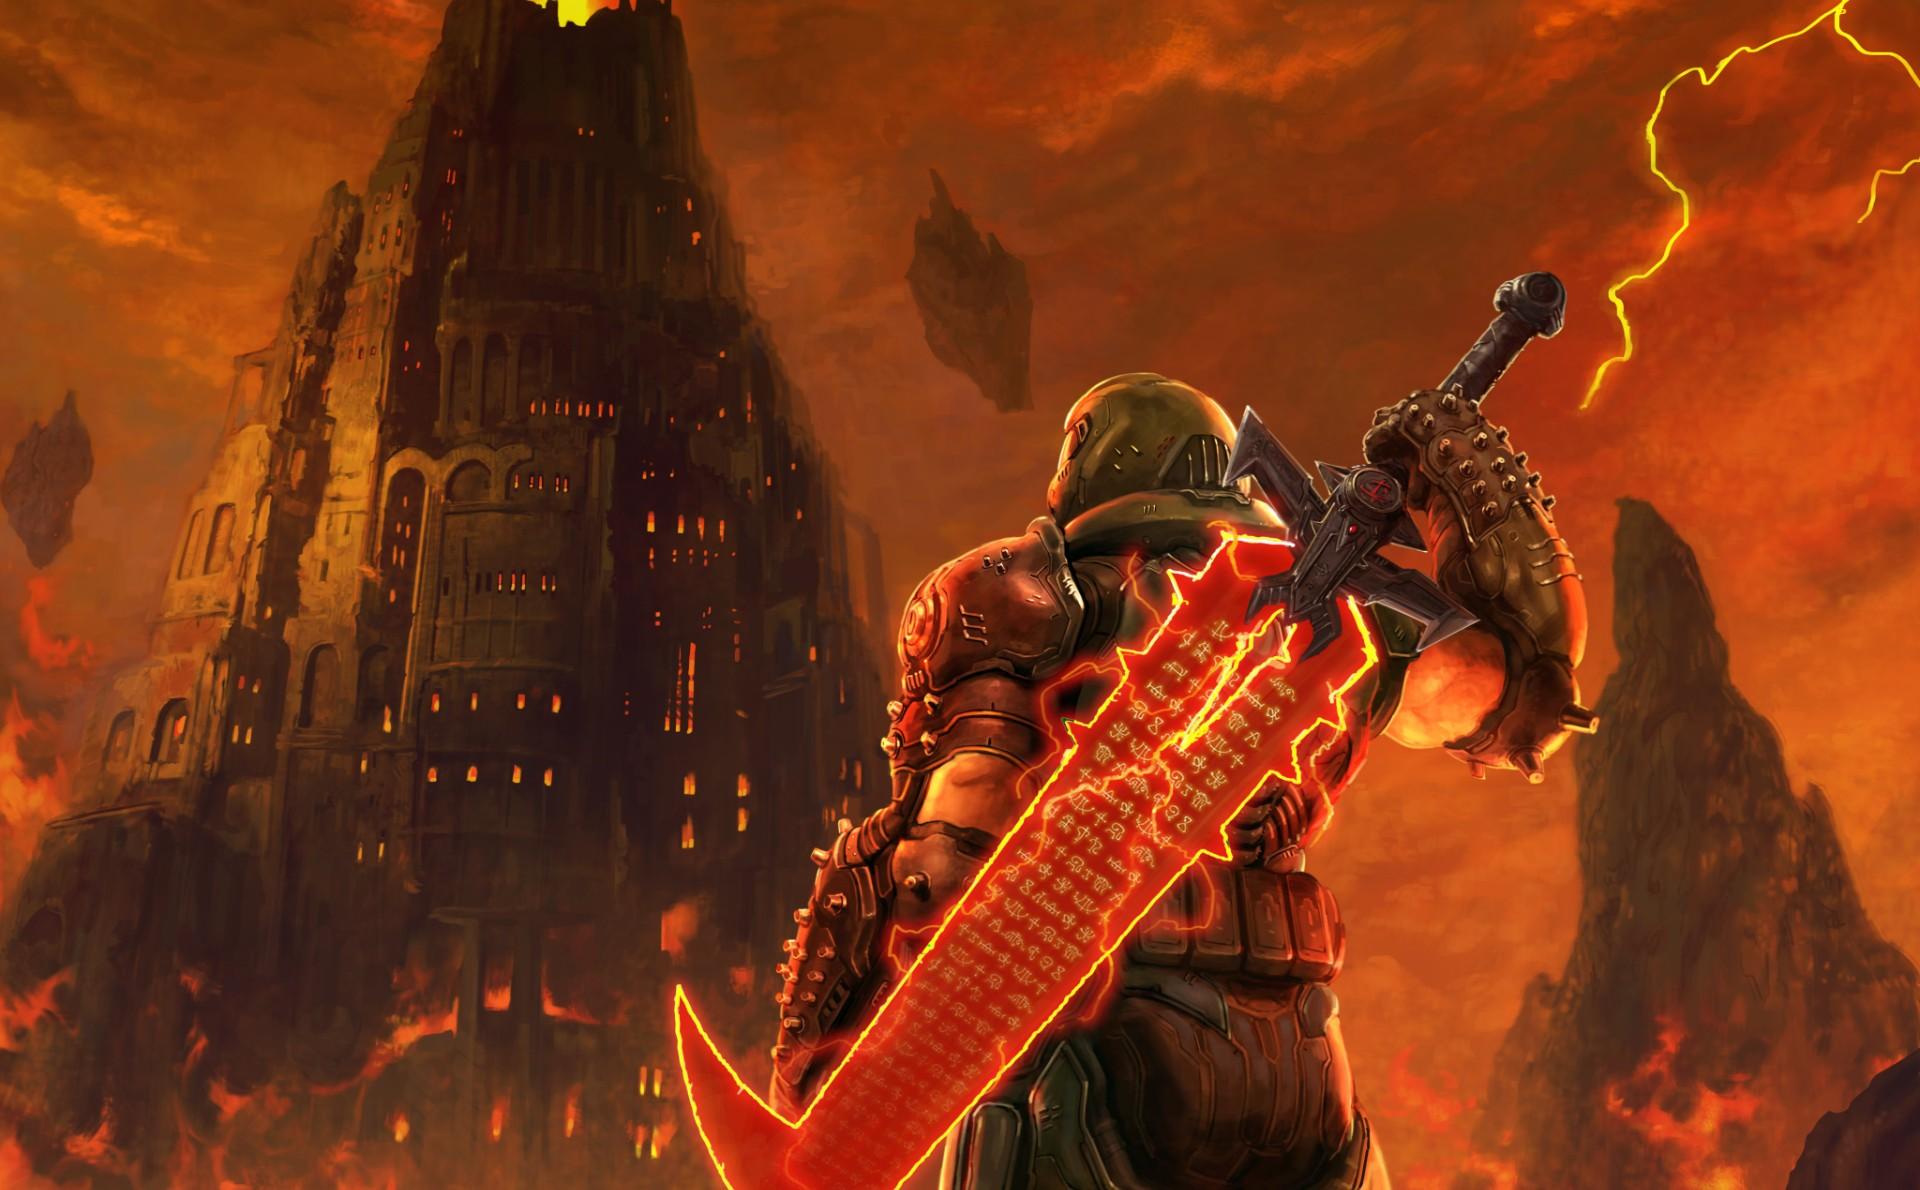 The Doom Eternal team created a nice little tribute to Final Fantasy VII Remake screenshot